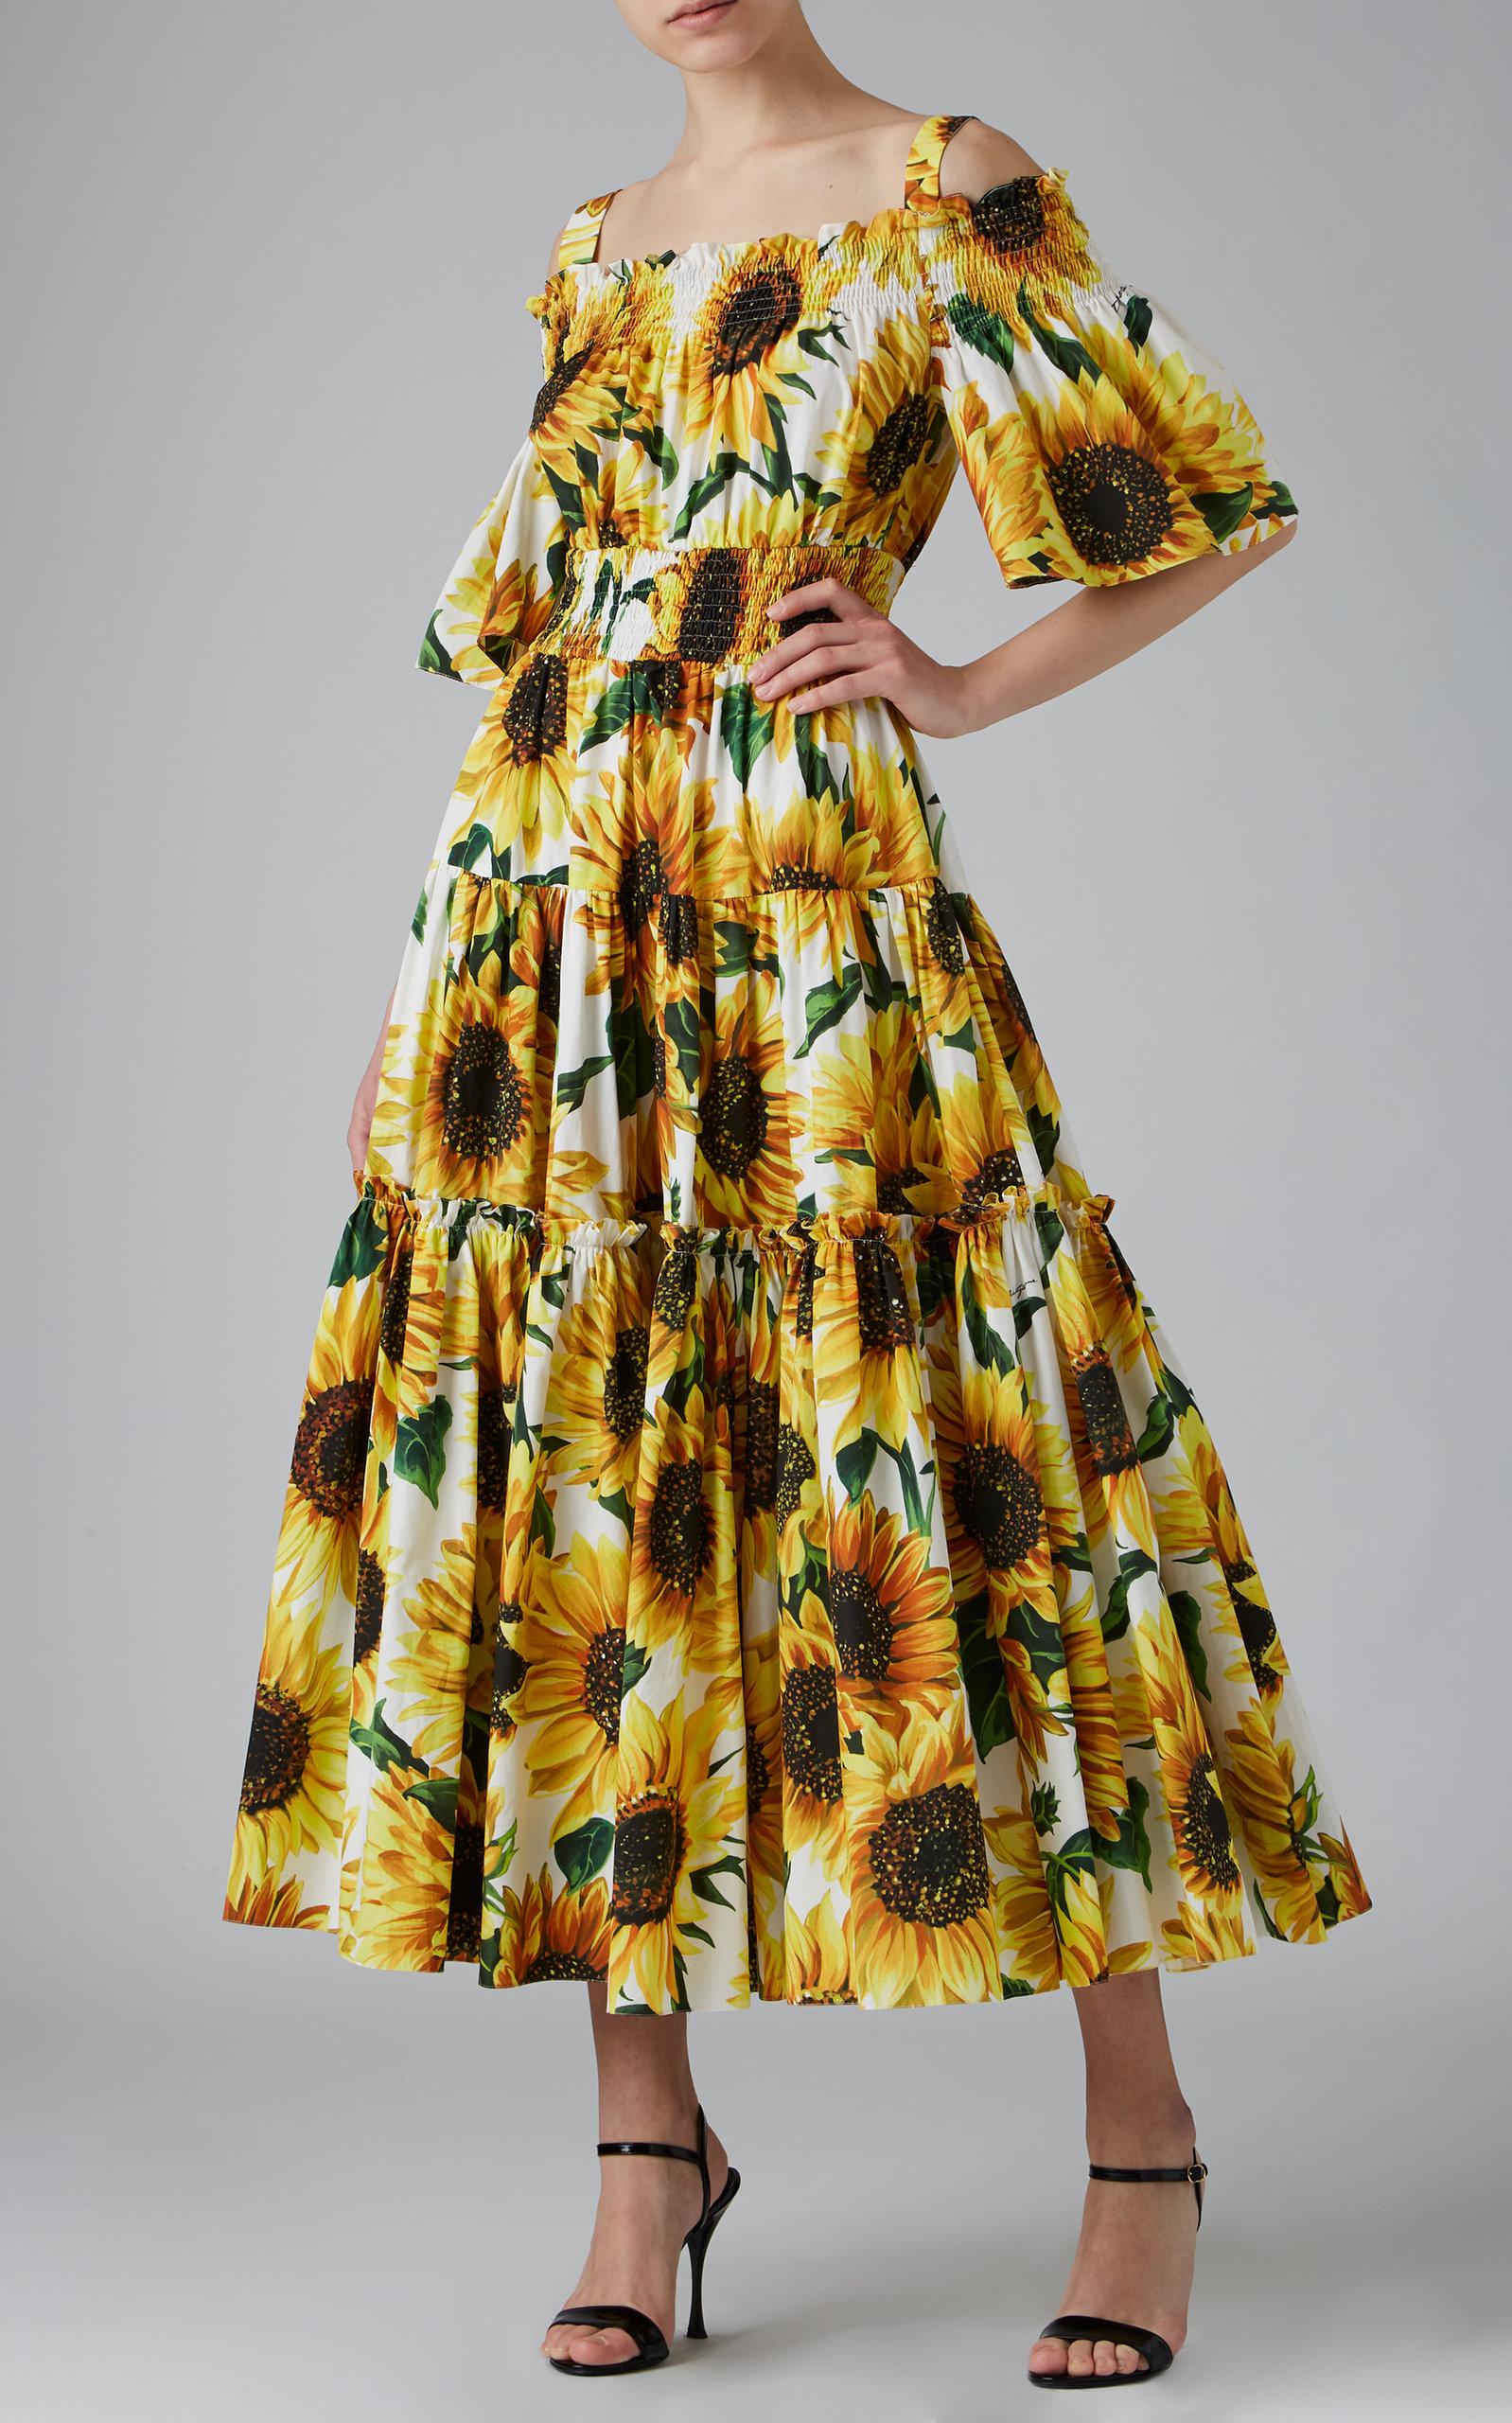 Dolce Gabbana Off The Shoulder Smocked Floral Print Cotton Maxi Dress In 2021 Fashion Maxi Dress Cotton Glamour Fashion [ 2560 x 1598 Pixel ]